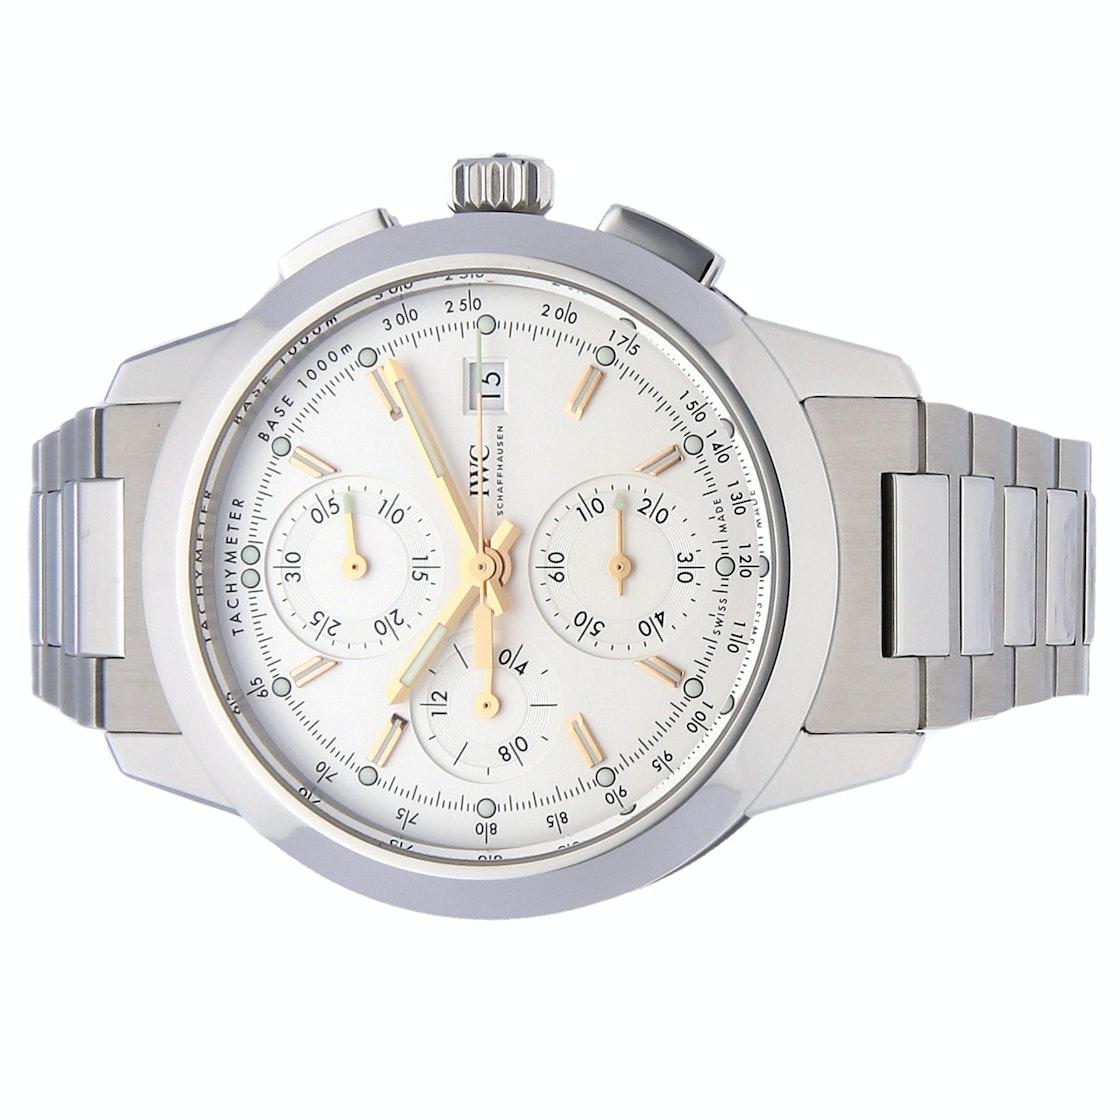 IWC Ingenieur Chronograph IW3808-01